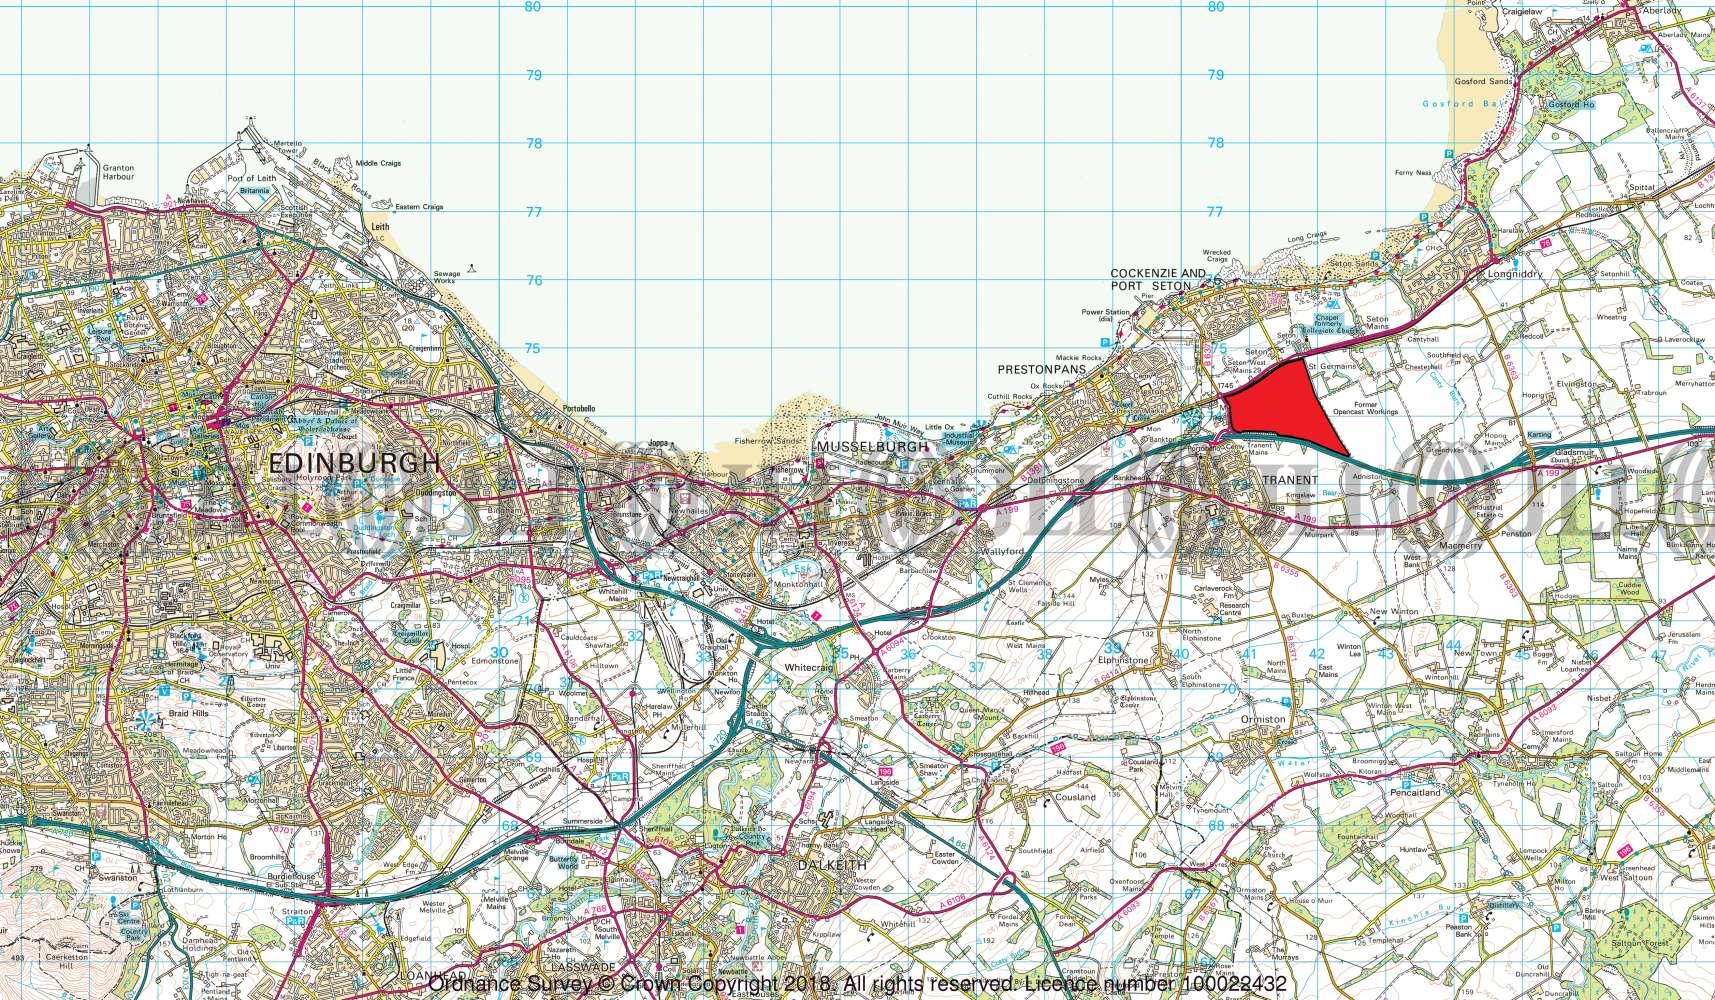 Land Tranent, EH33 1DT - Blindwells - 64887